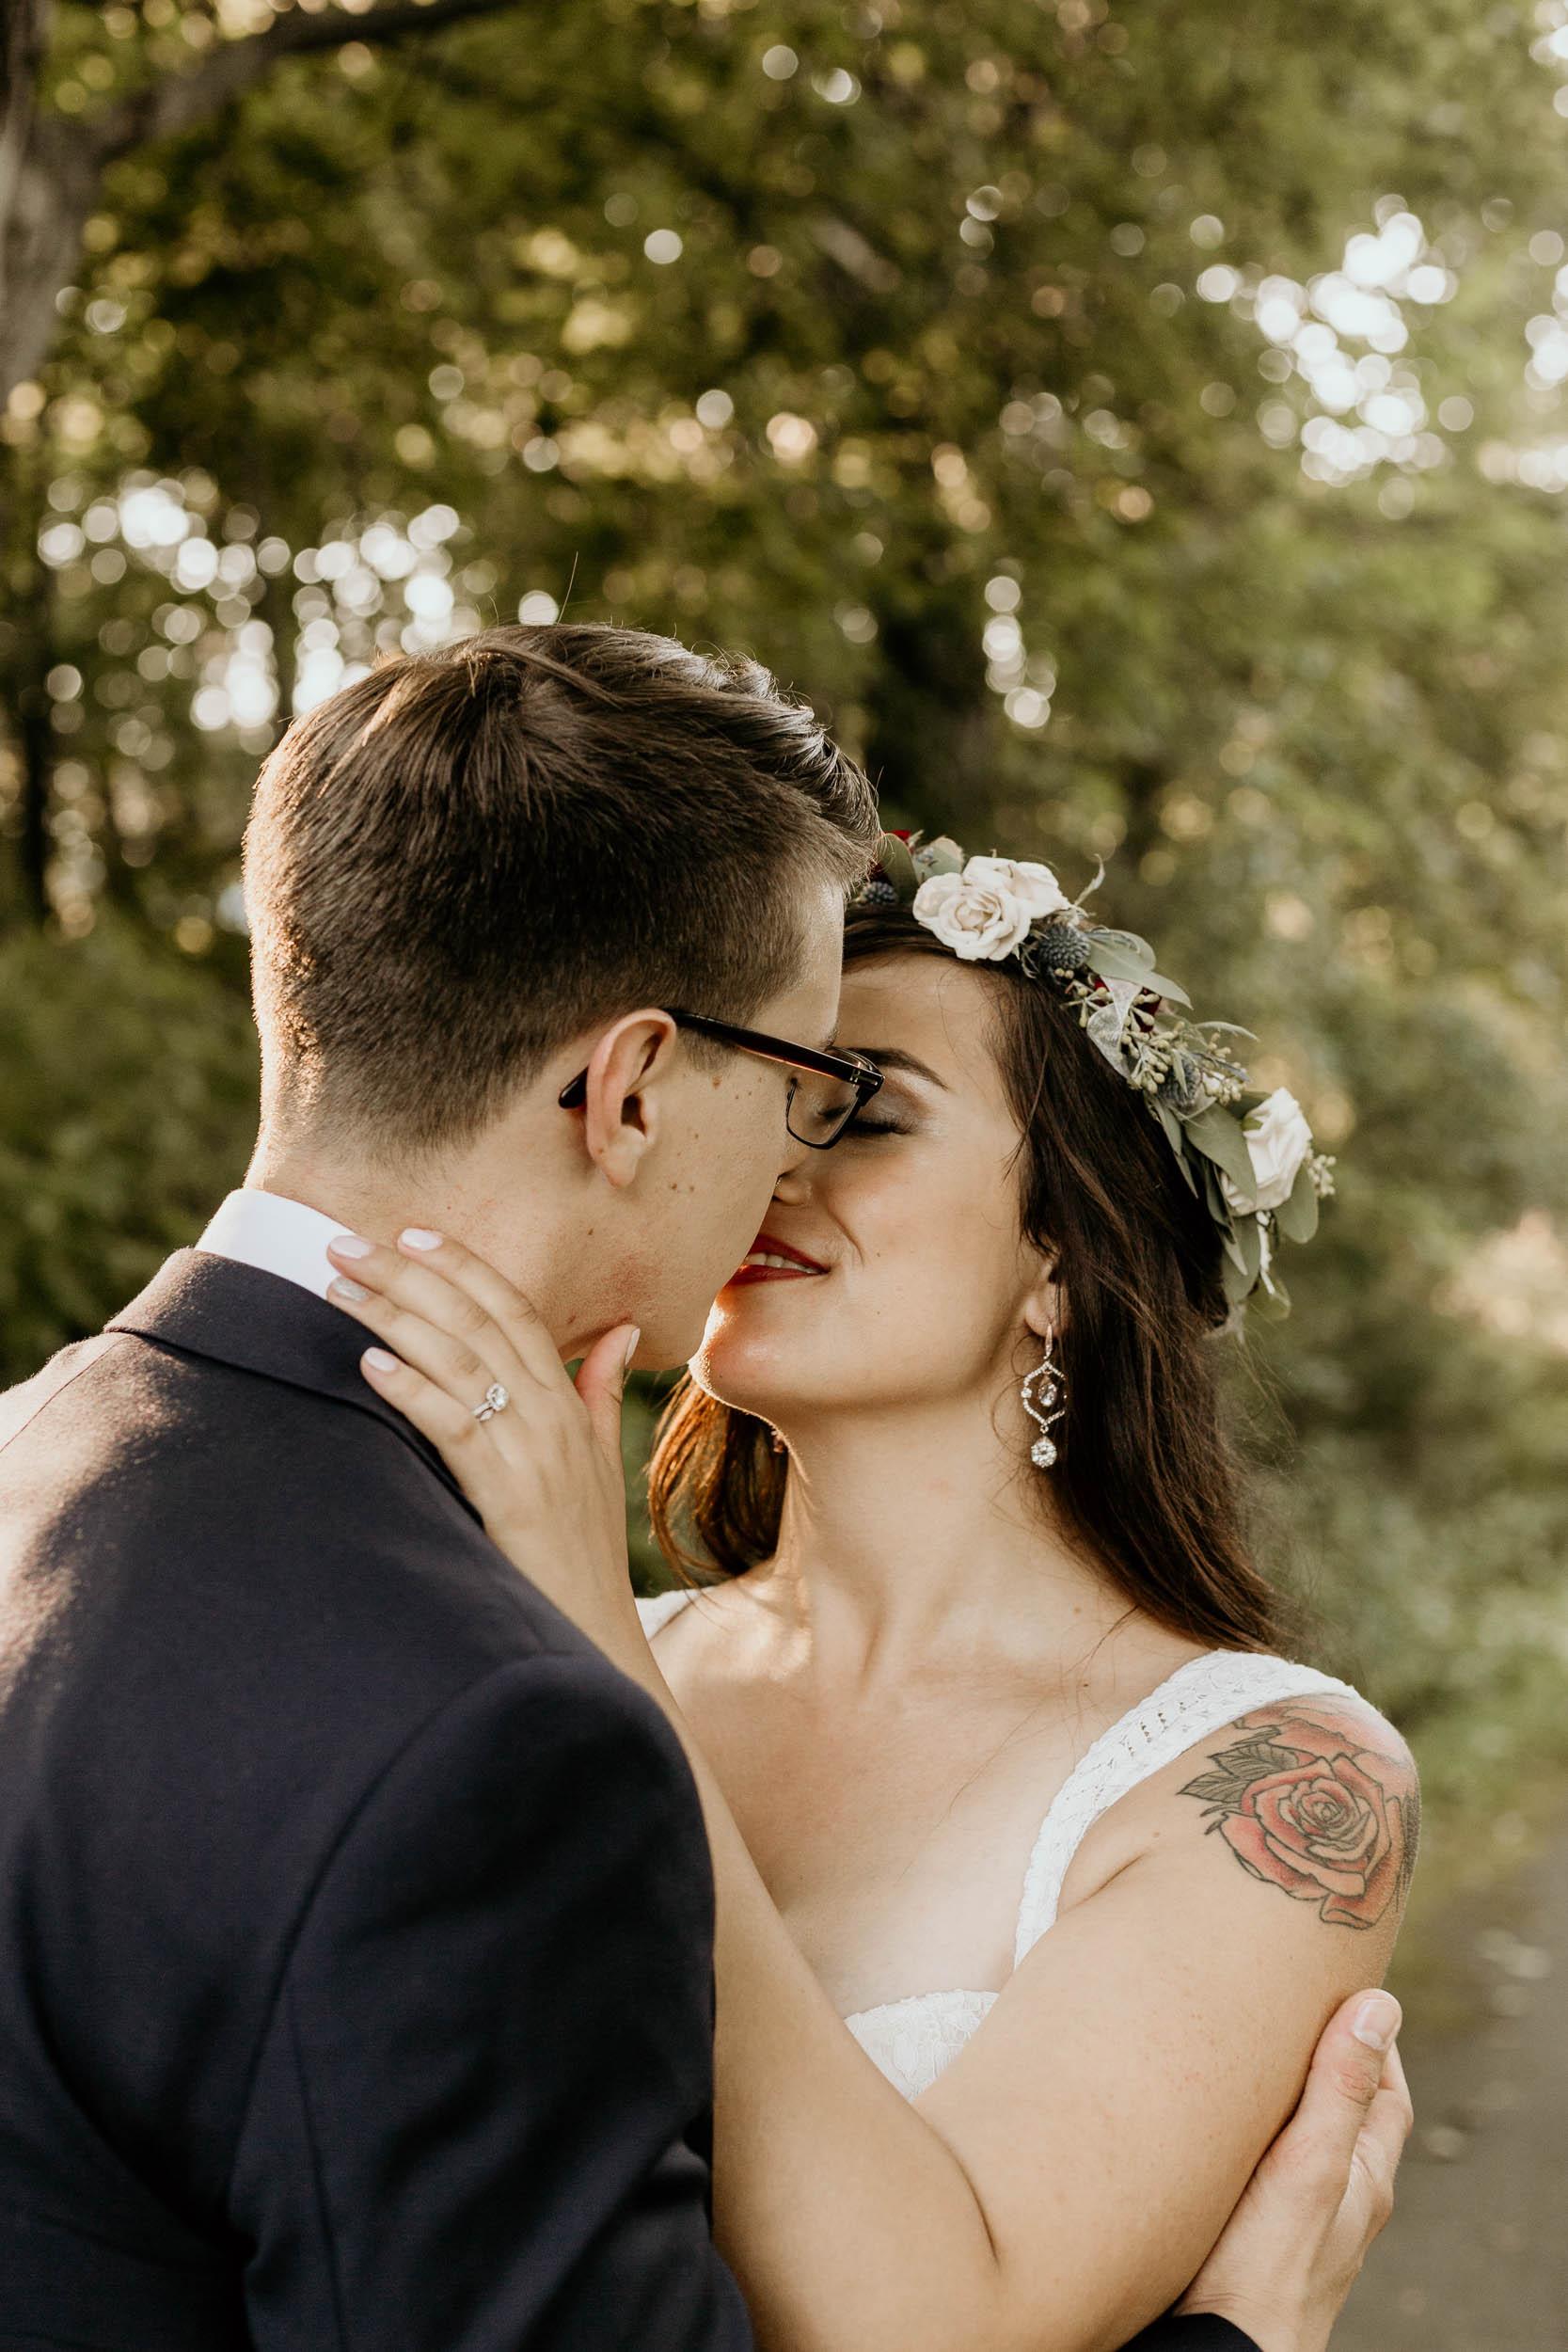 intimate-wedding-elopement-photographer-ottawa-toronto-8069.jpg